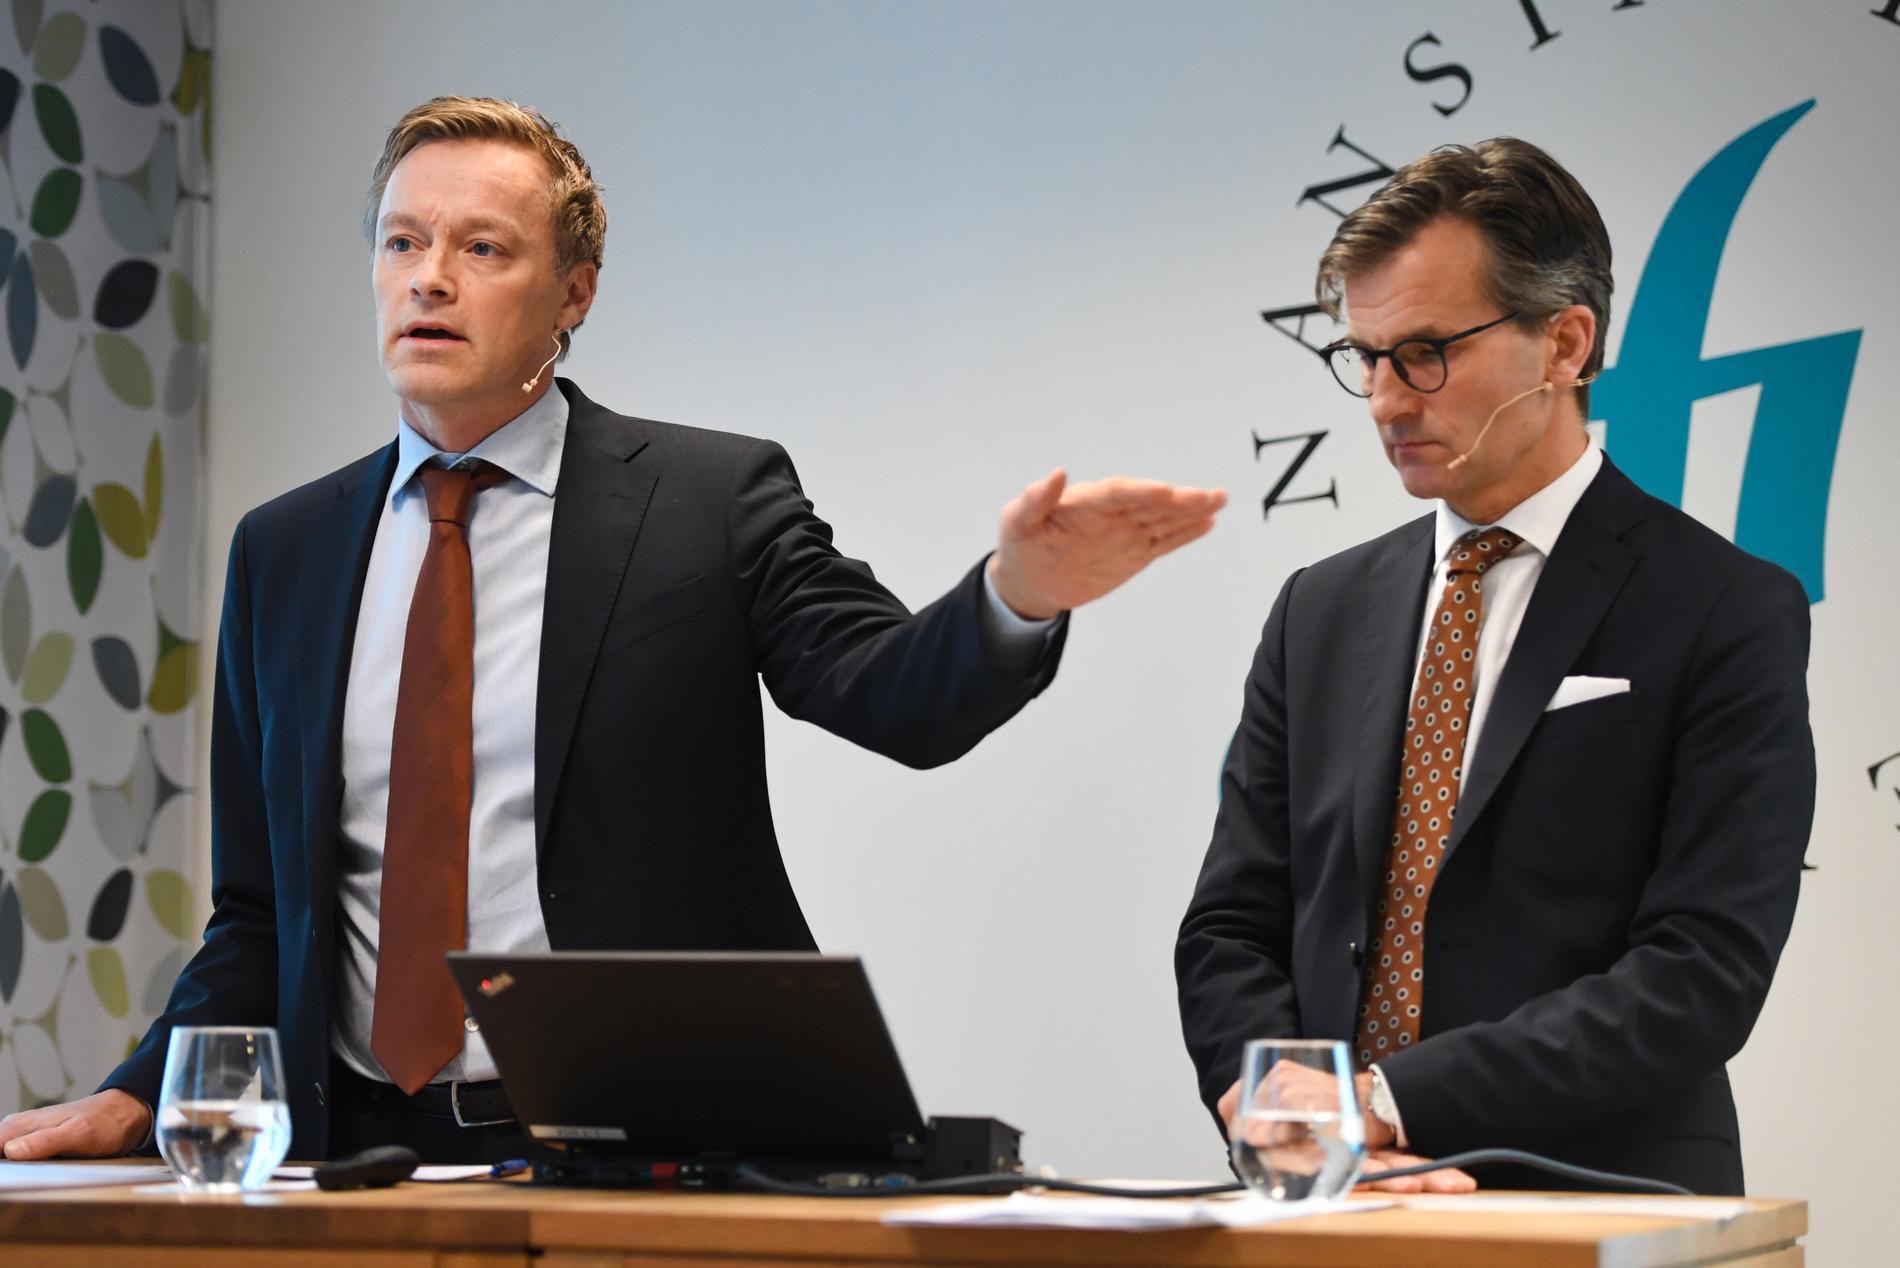 Henrik Braconier och Erik Thedéen på Finansinspektionen.